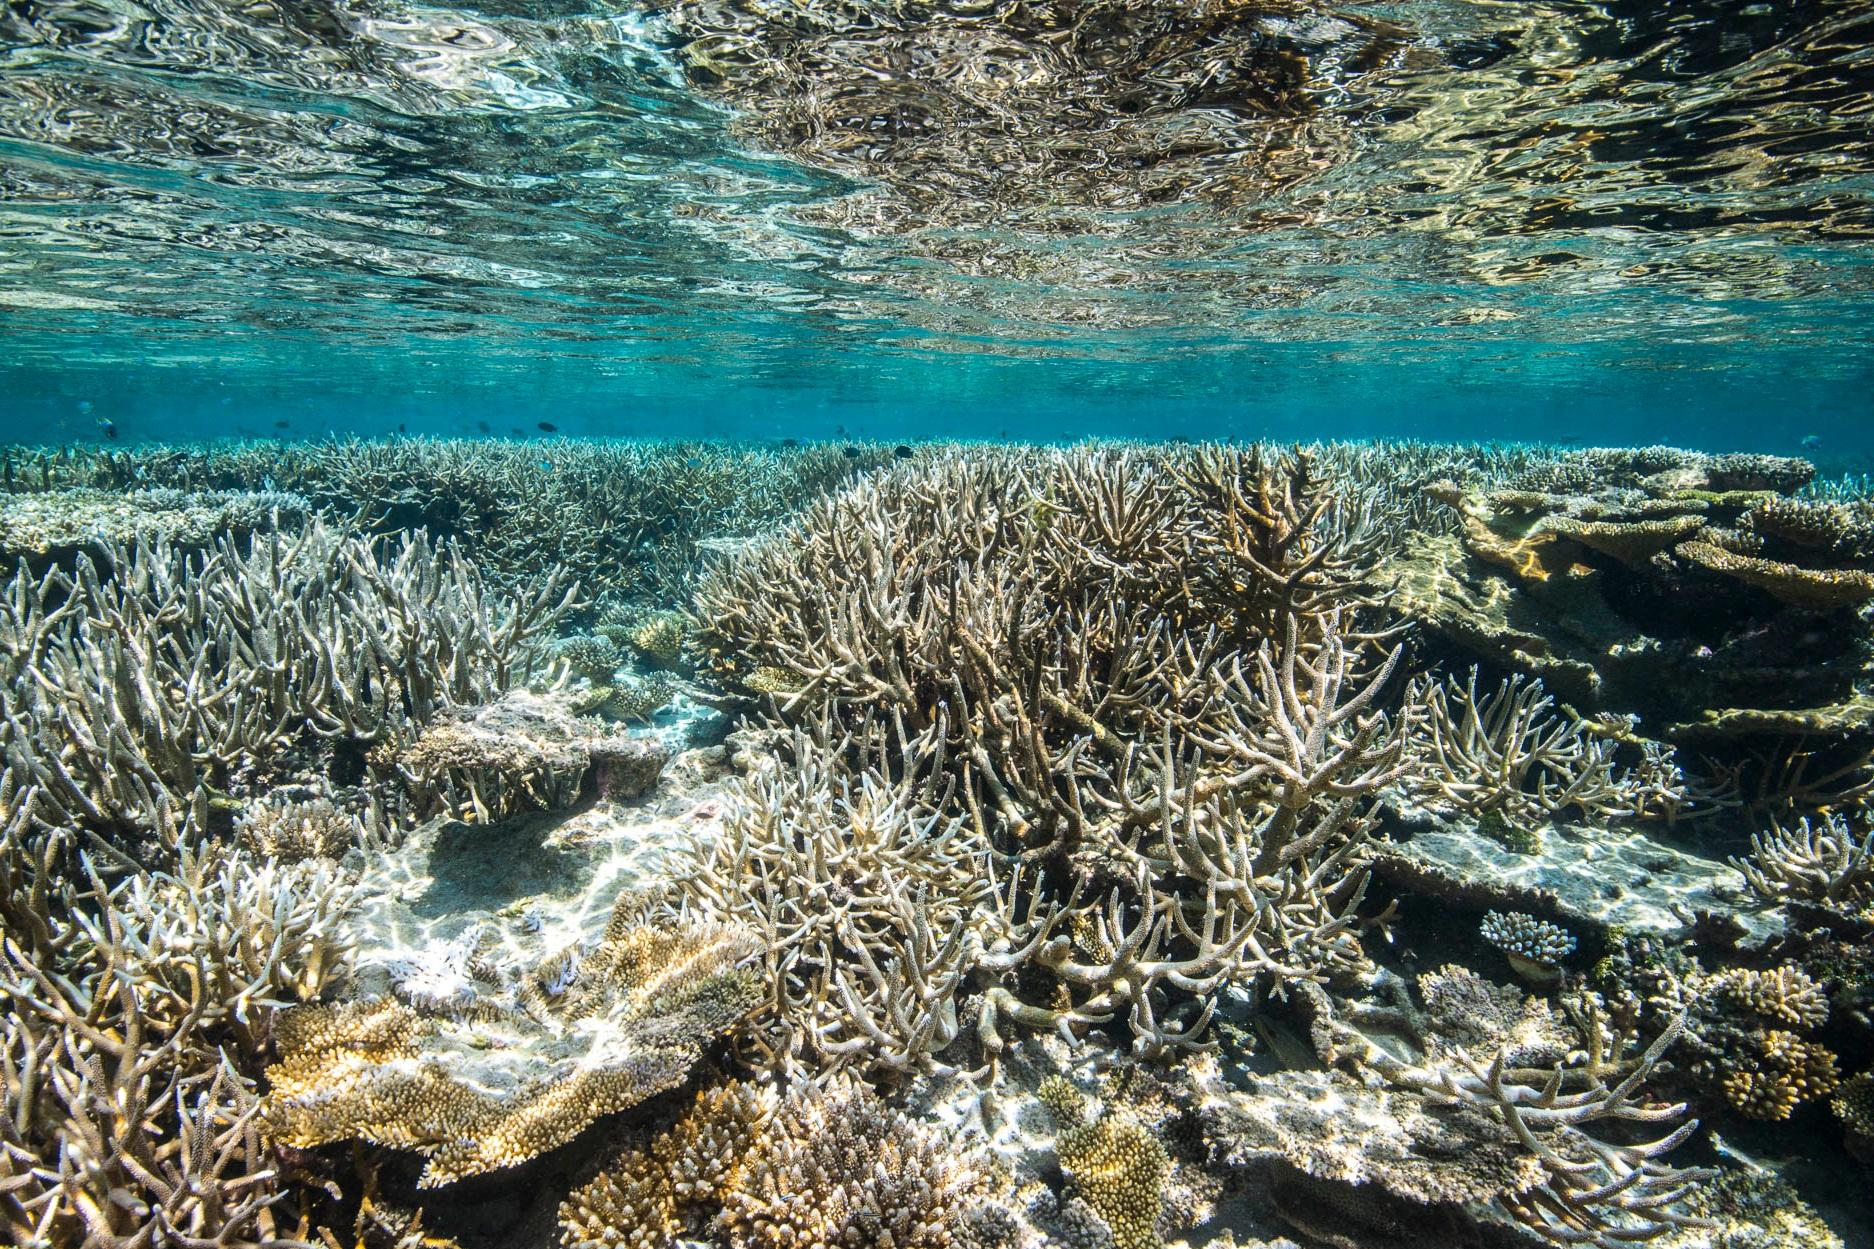 GAAFU ALIFU ATOLL, MALDIVES CREDIT: WARREN BAVERSTOCK / coral reef image bank